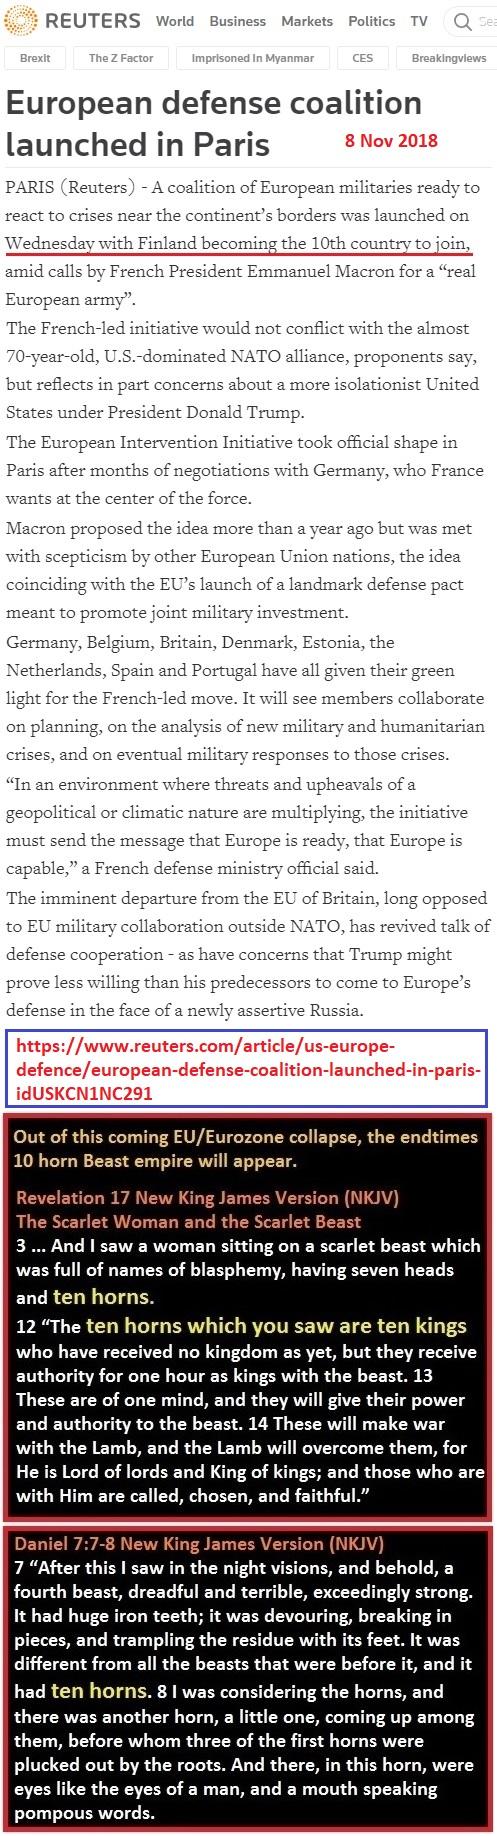 https://www.reuters.com/article/us-europe-defence/european-defense-coalition-launched-in-paris-idUSKCN1NC291